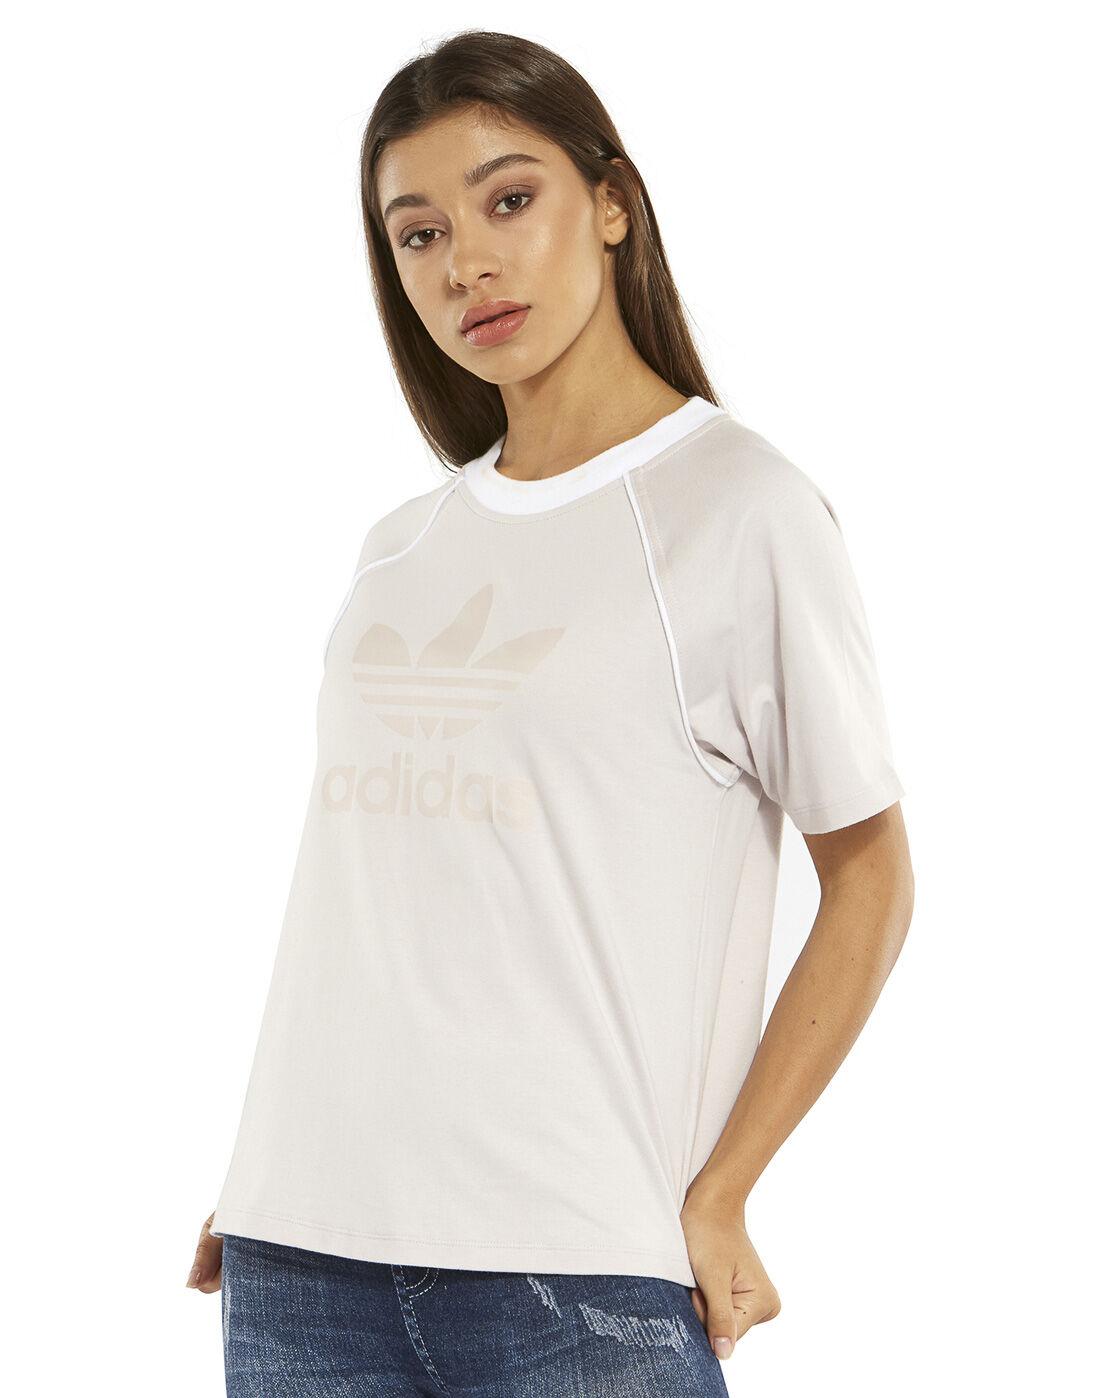 Sports Women's Baby Originals Adidas T Life Shirt Pink Style v8wpv